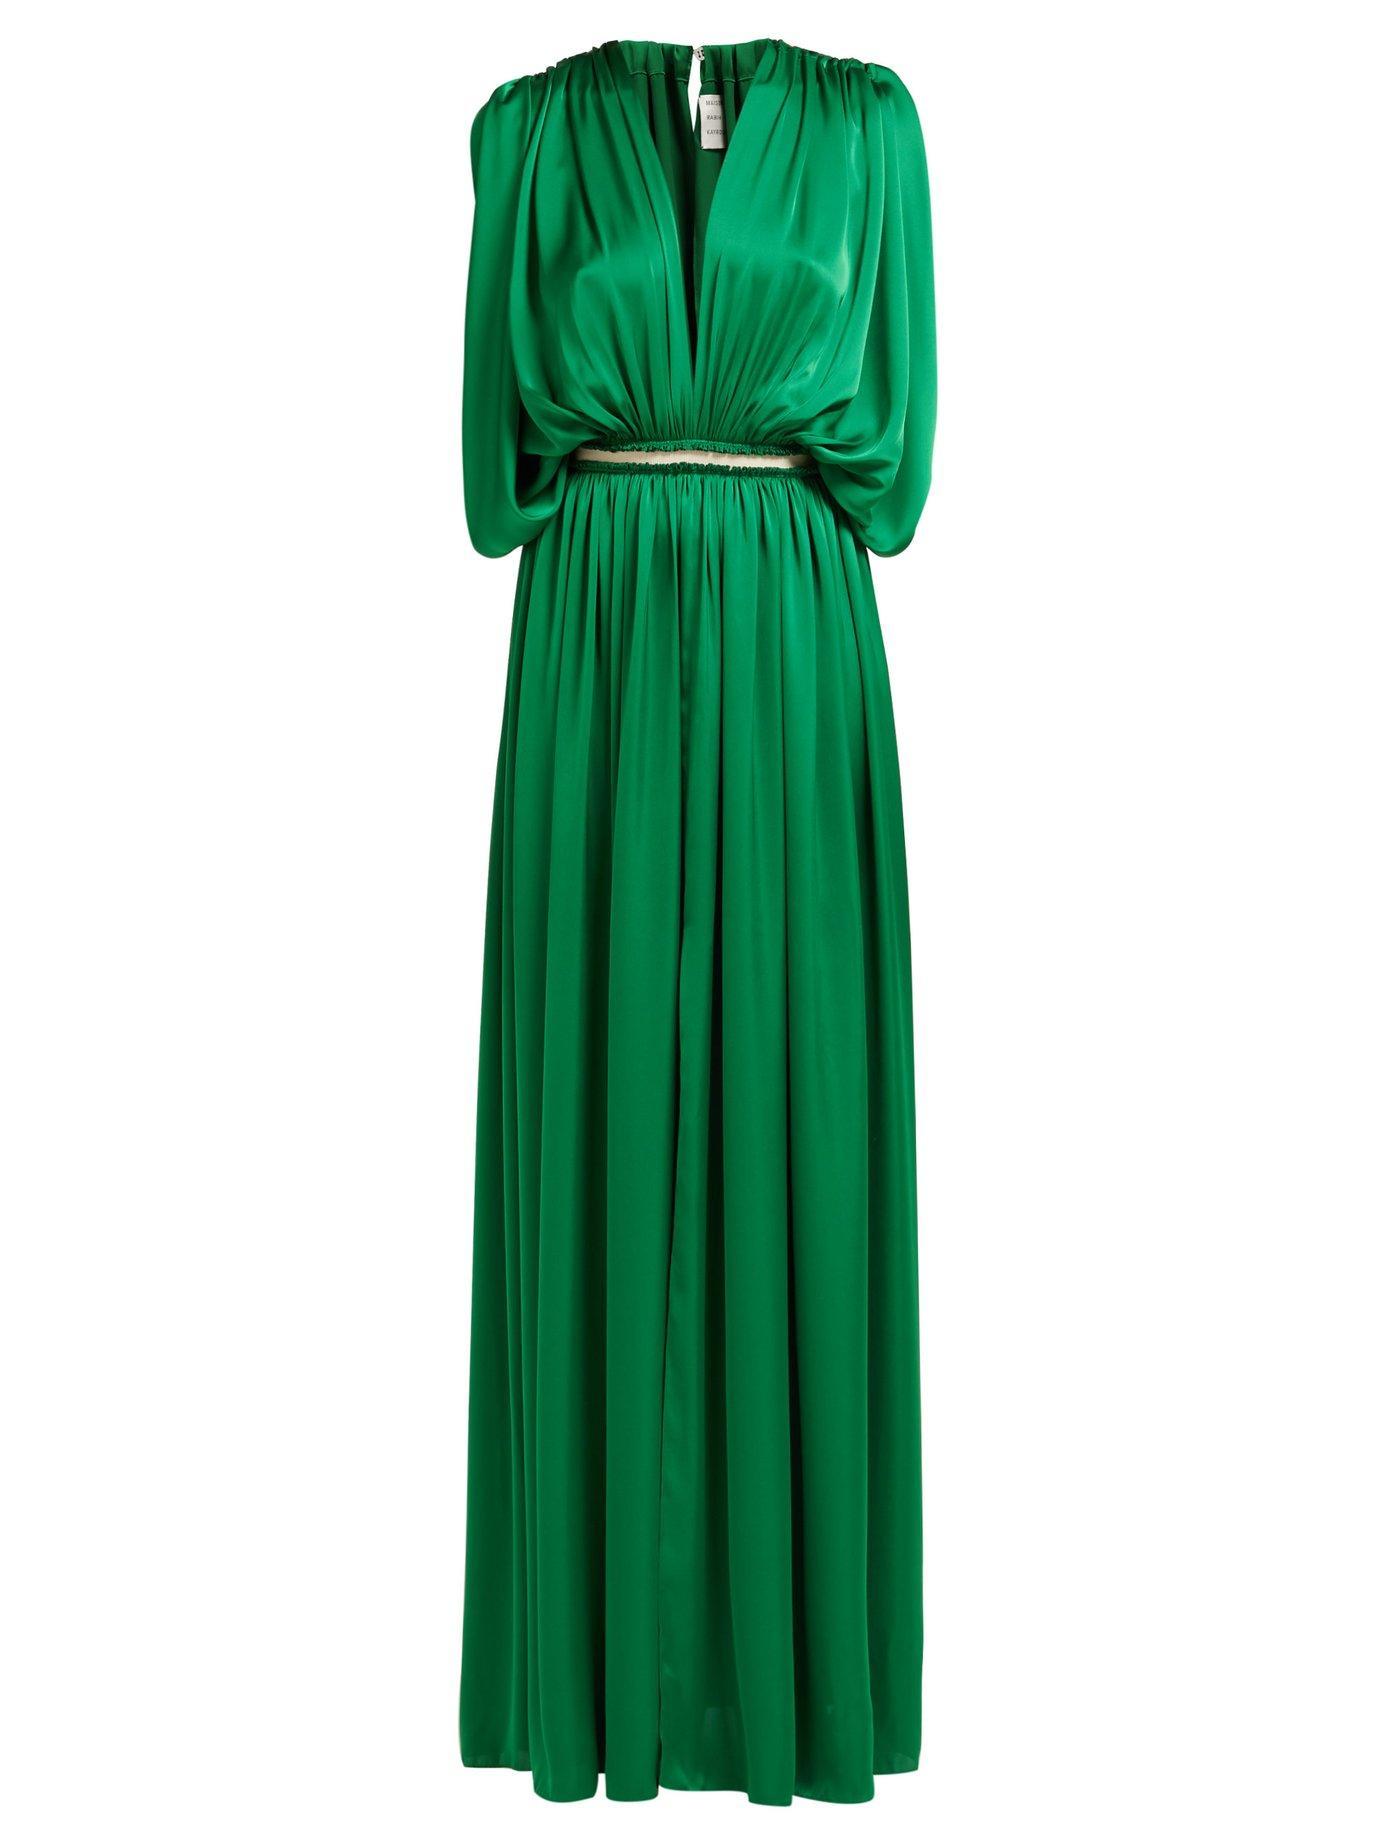 22ebc36244da1 Lyst - Maison Rabih Kayrouz Draped Charmeuse Gown in Green